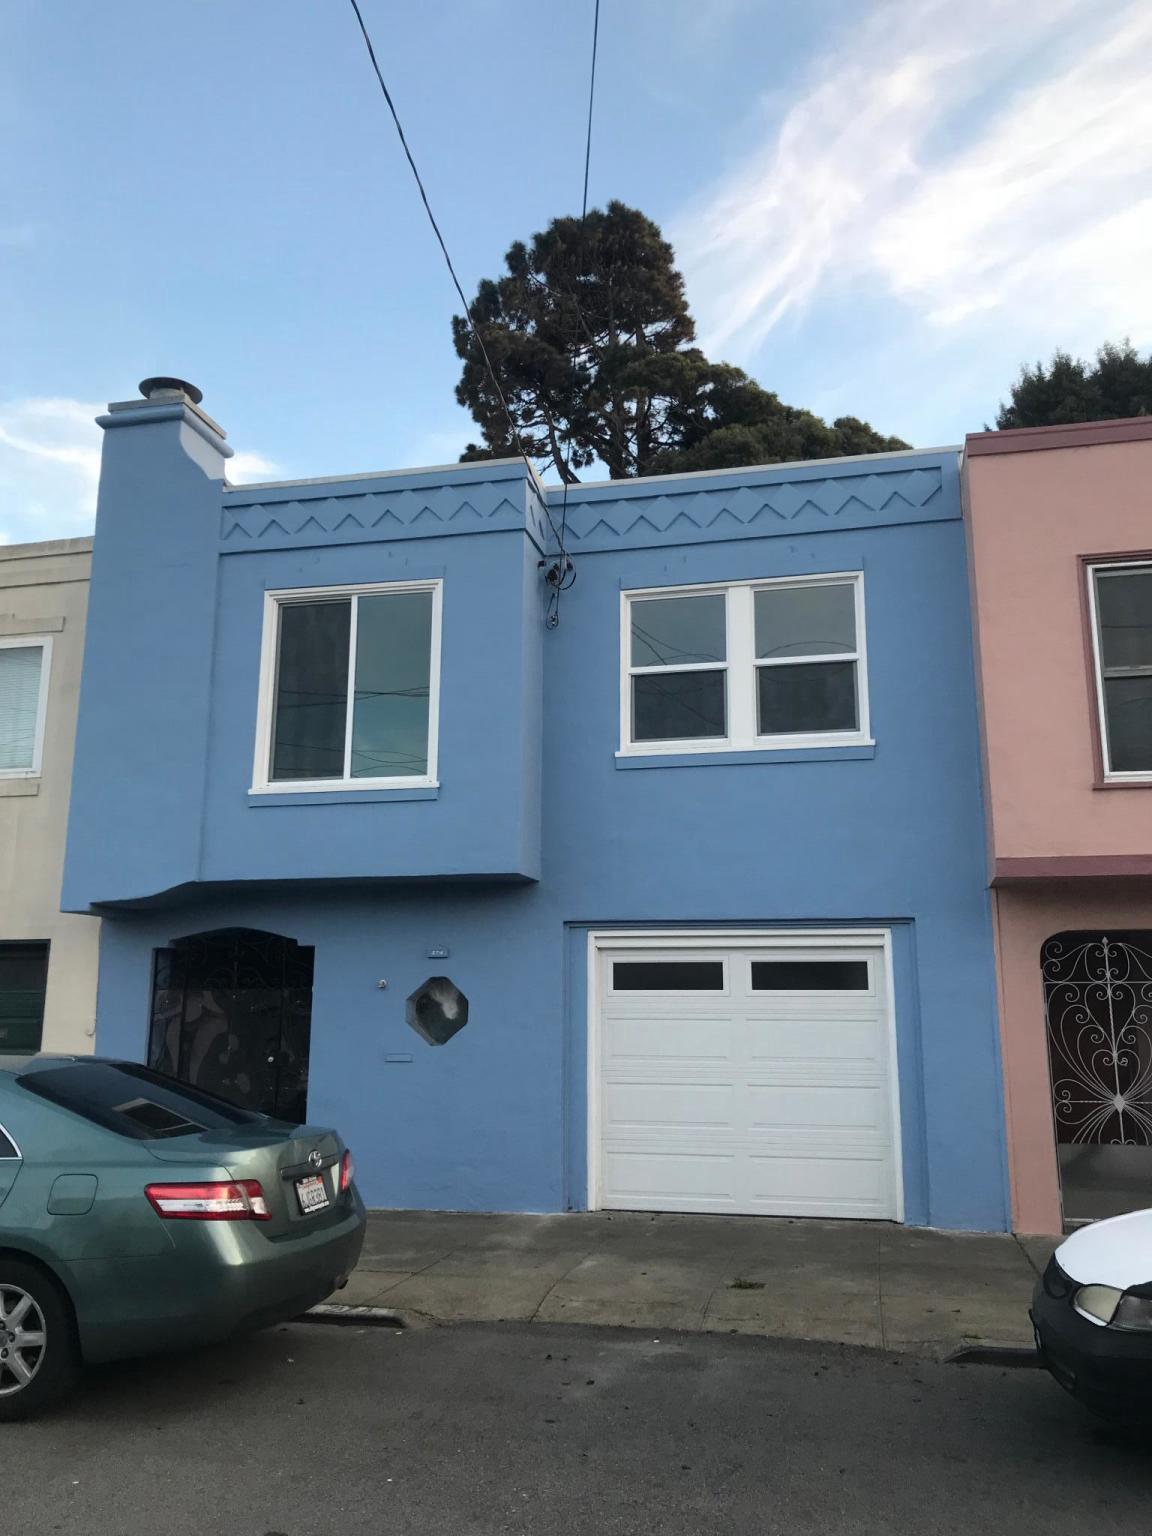 274 Maynard St For Rent - San Francisco, CA | Trulia